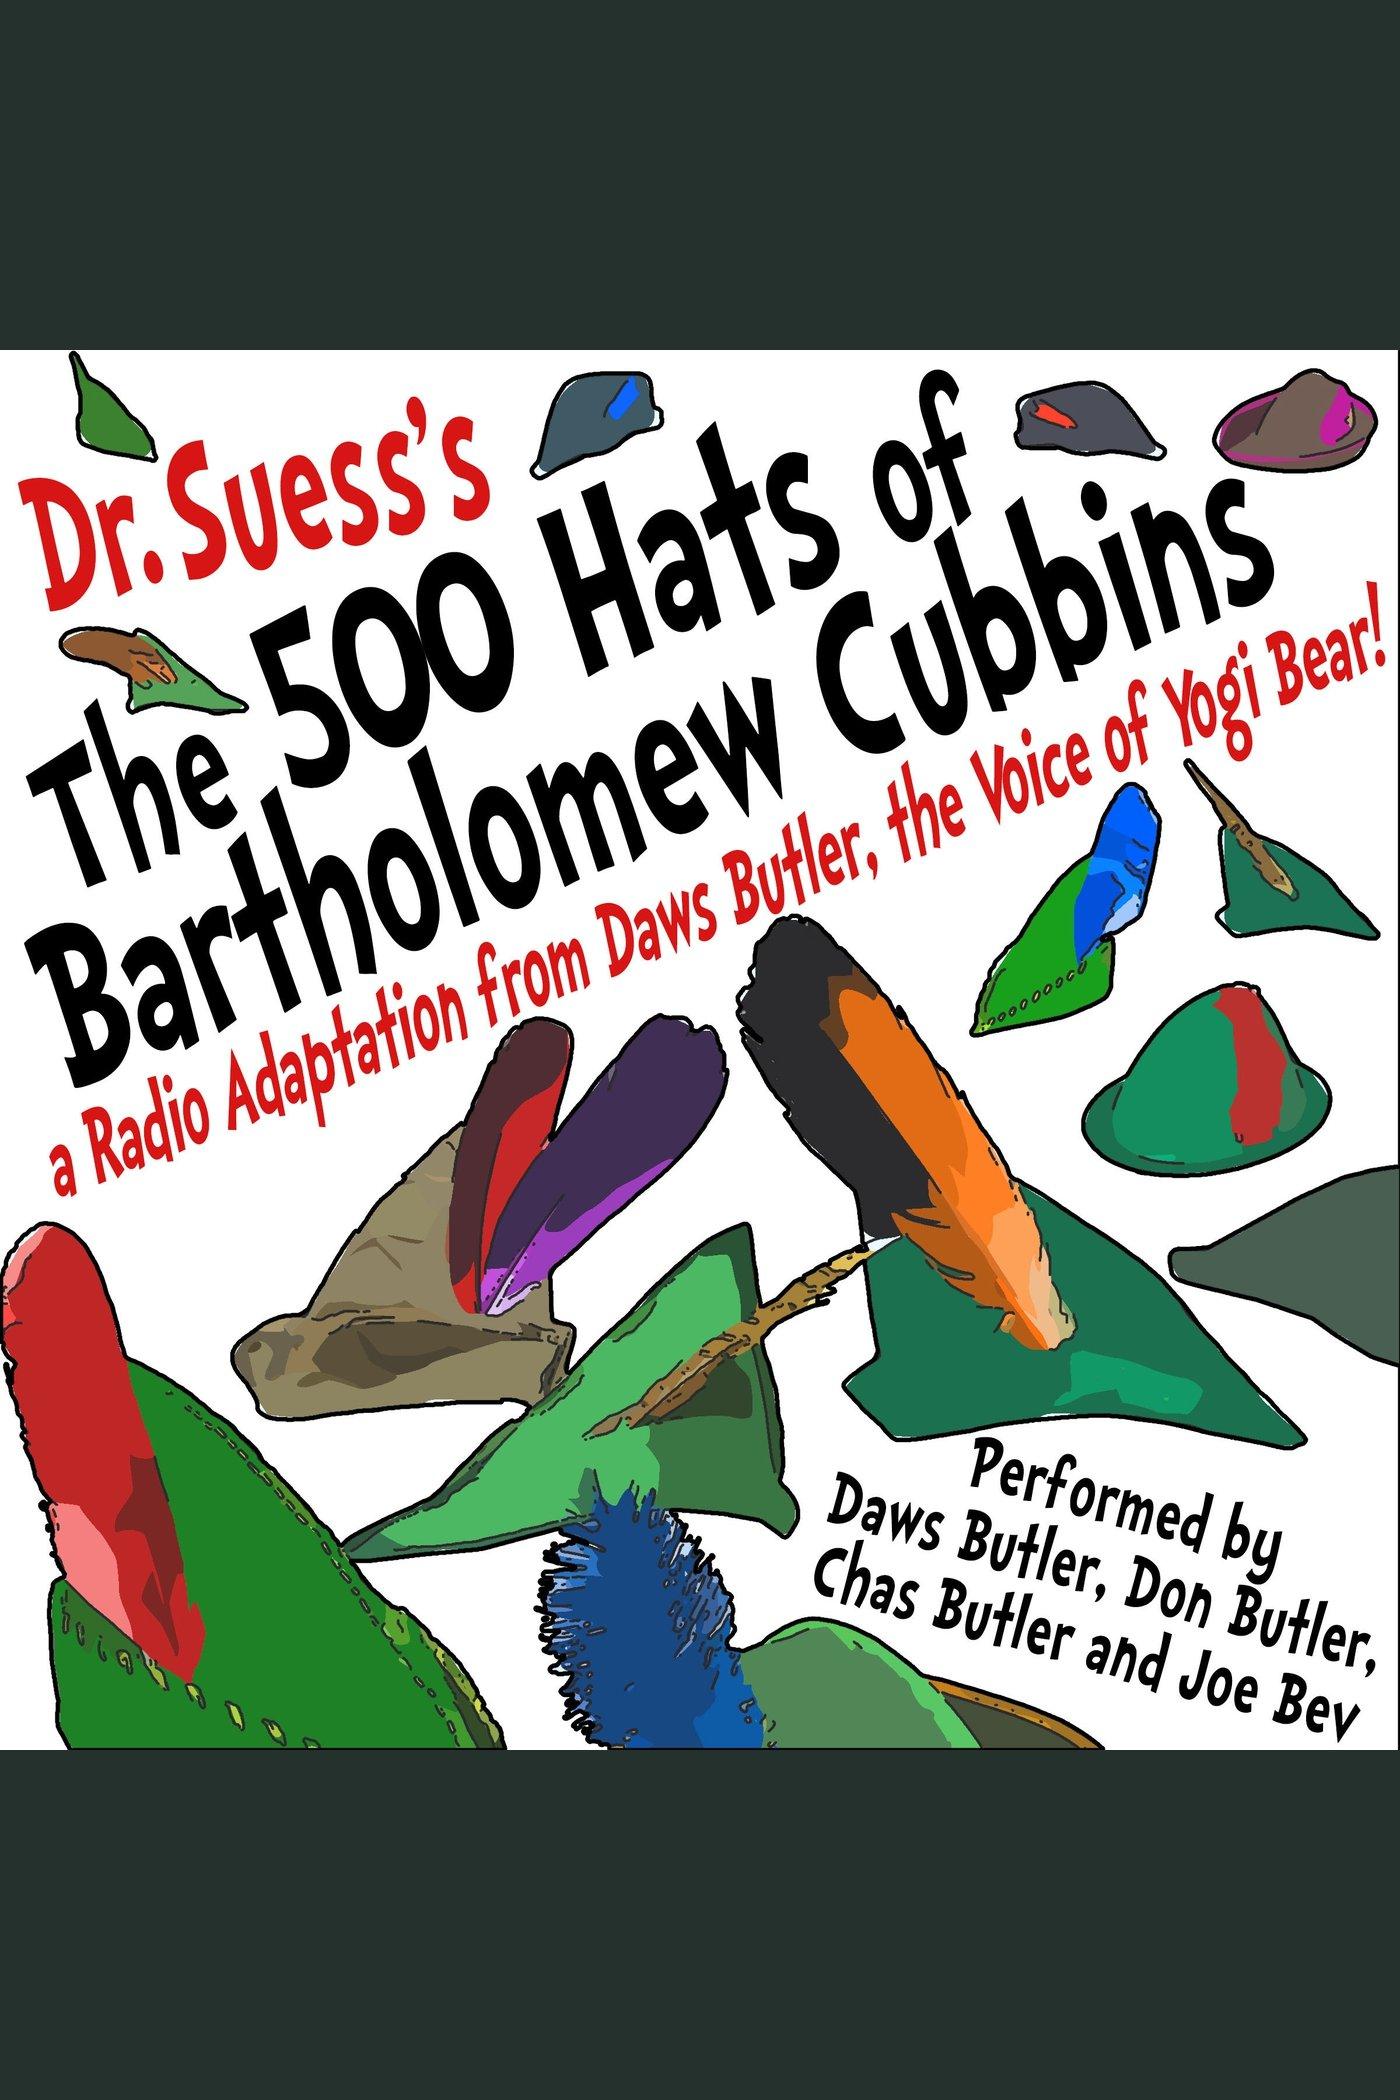 500 hats of Bartholomew Cubbins! cover image